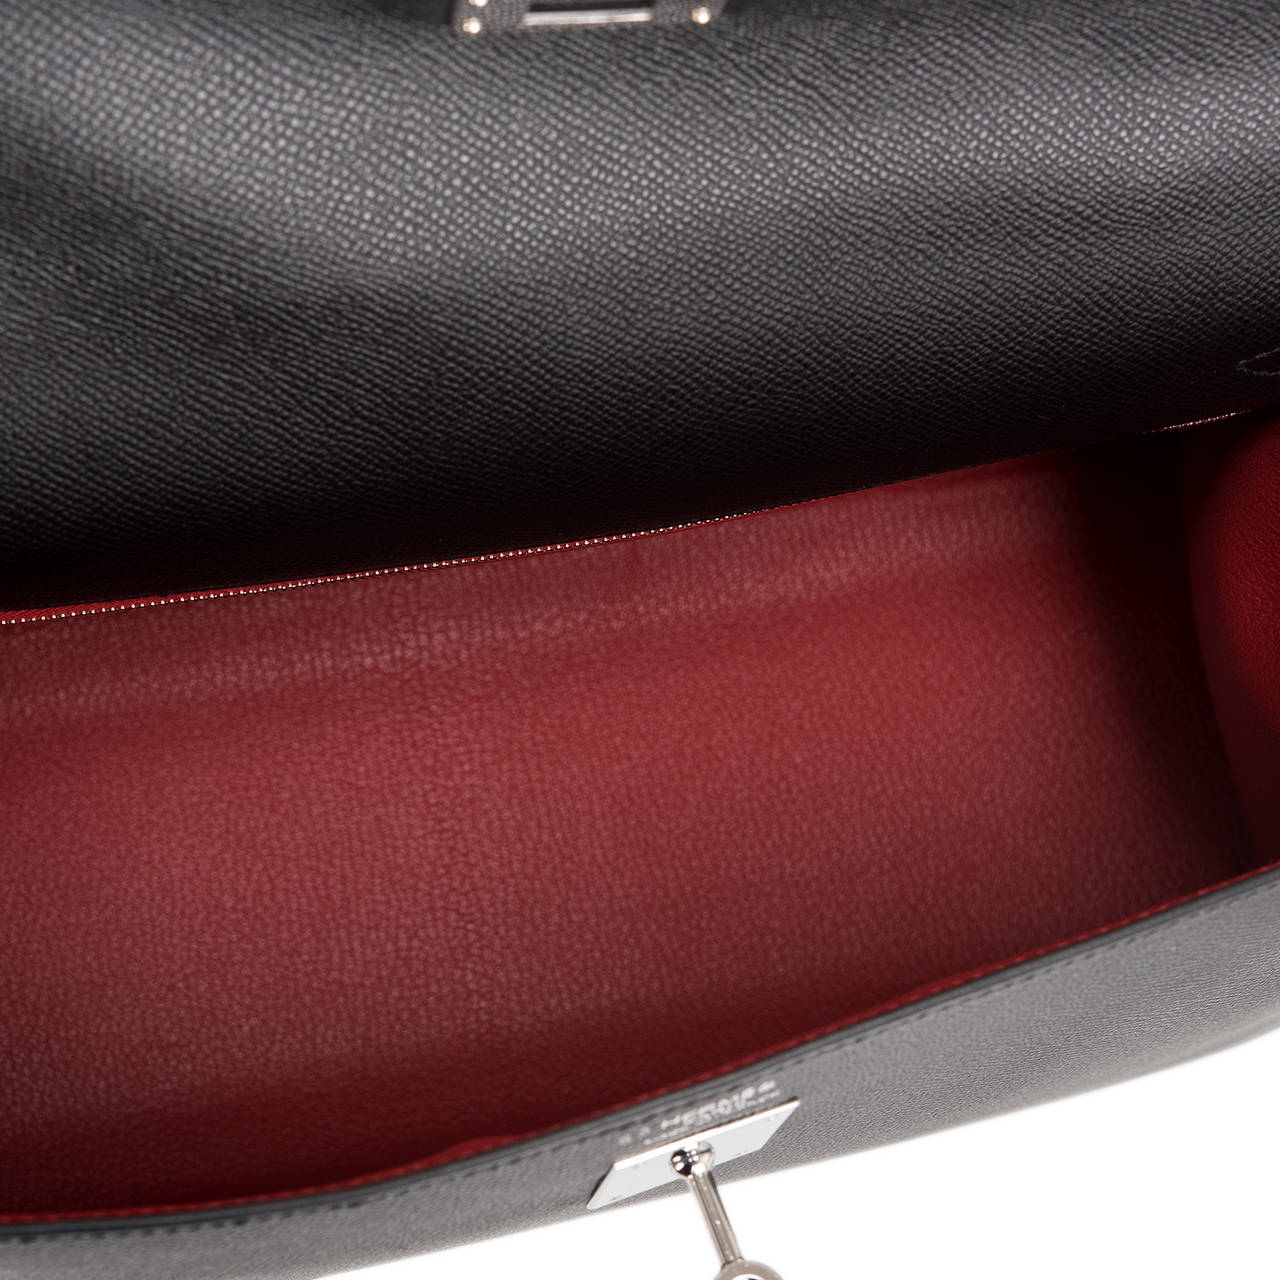 Hermes HSS Black And Rouge Casaque Epsom Sellier Kelly 35cm at 1stdibs